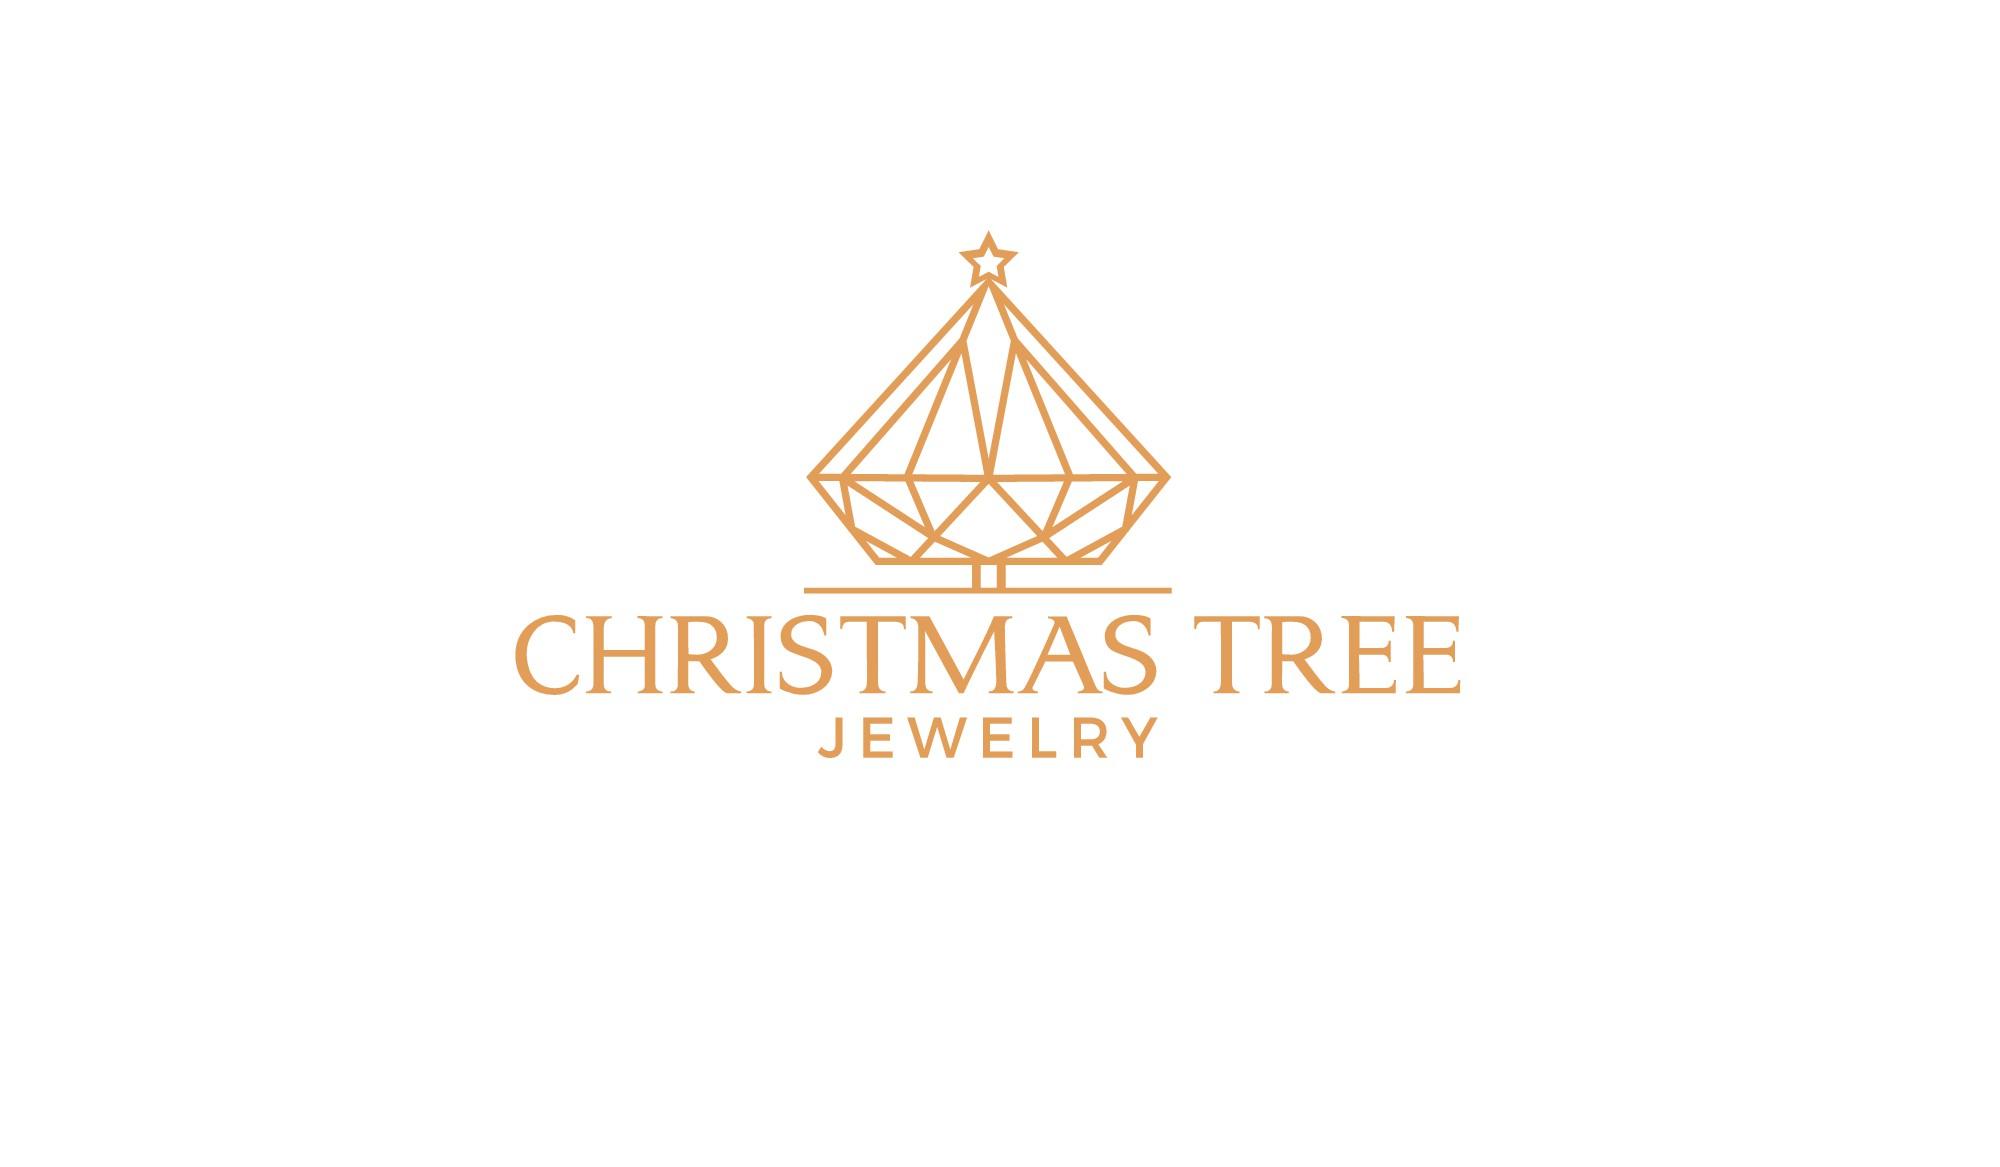 Design exclusive luxurious logo for Christmas Tree Jewelry designer